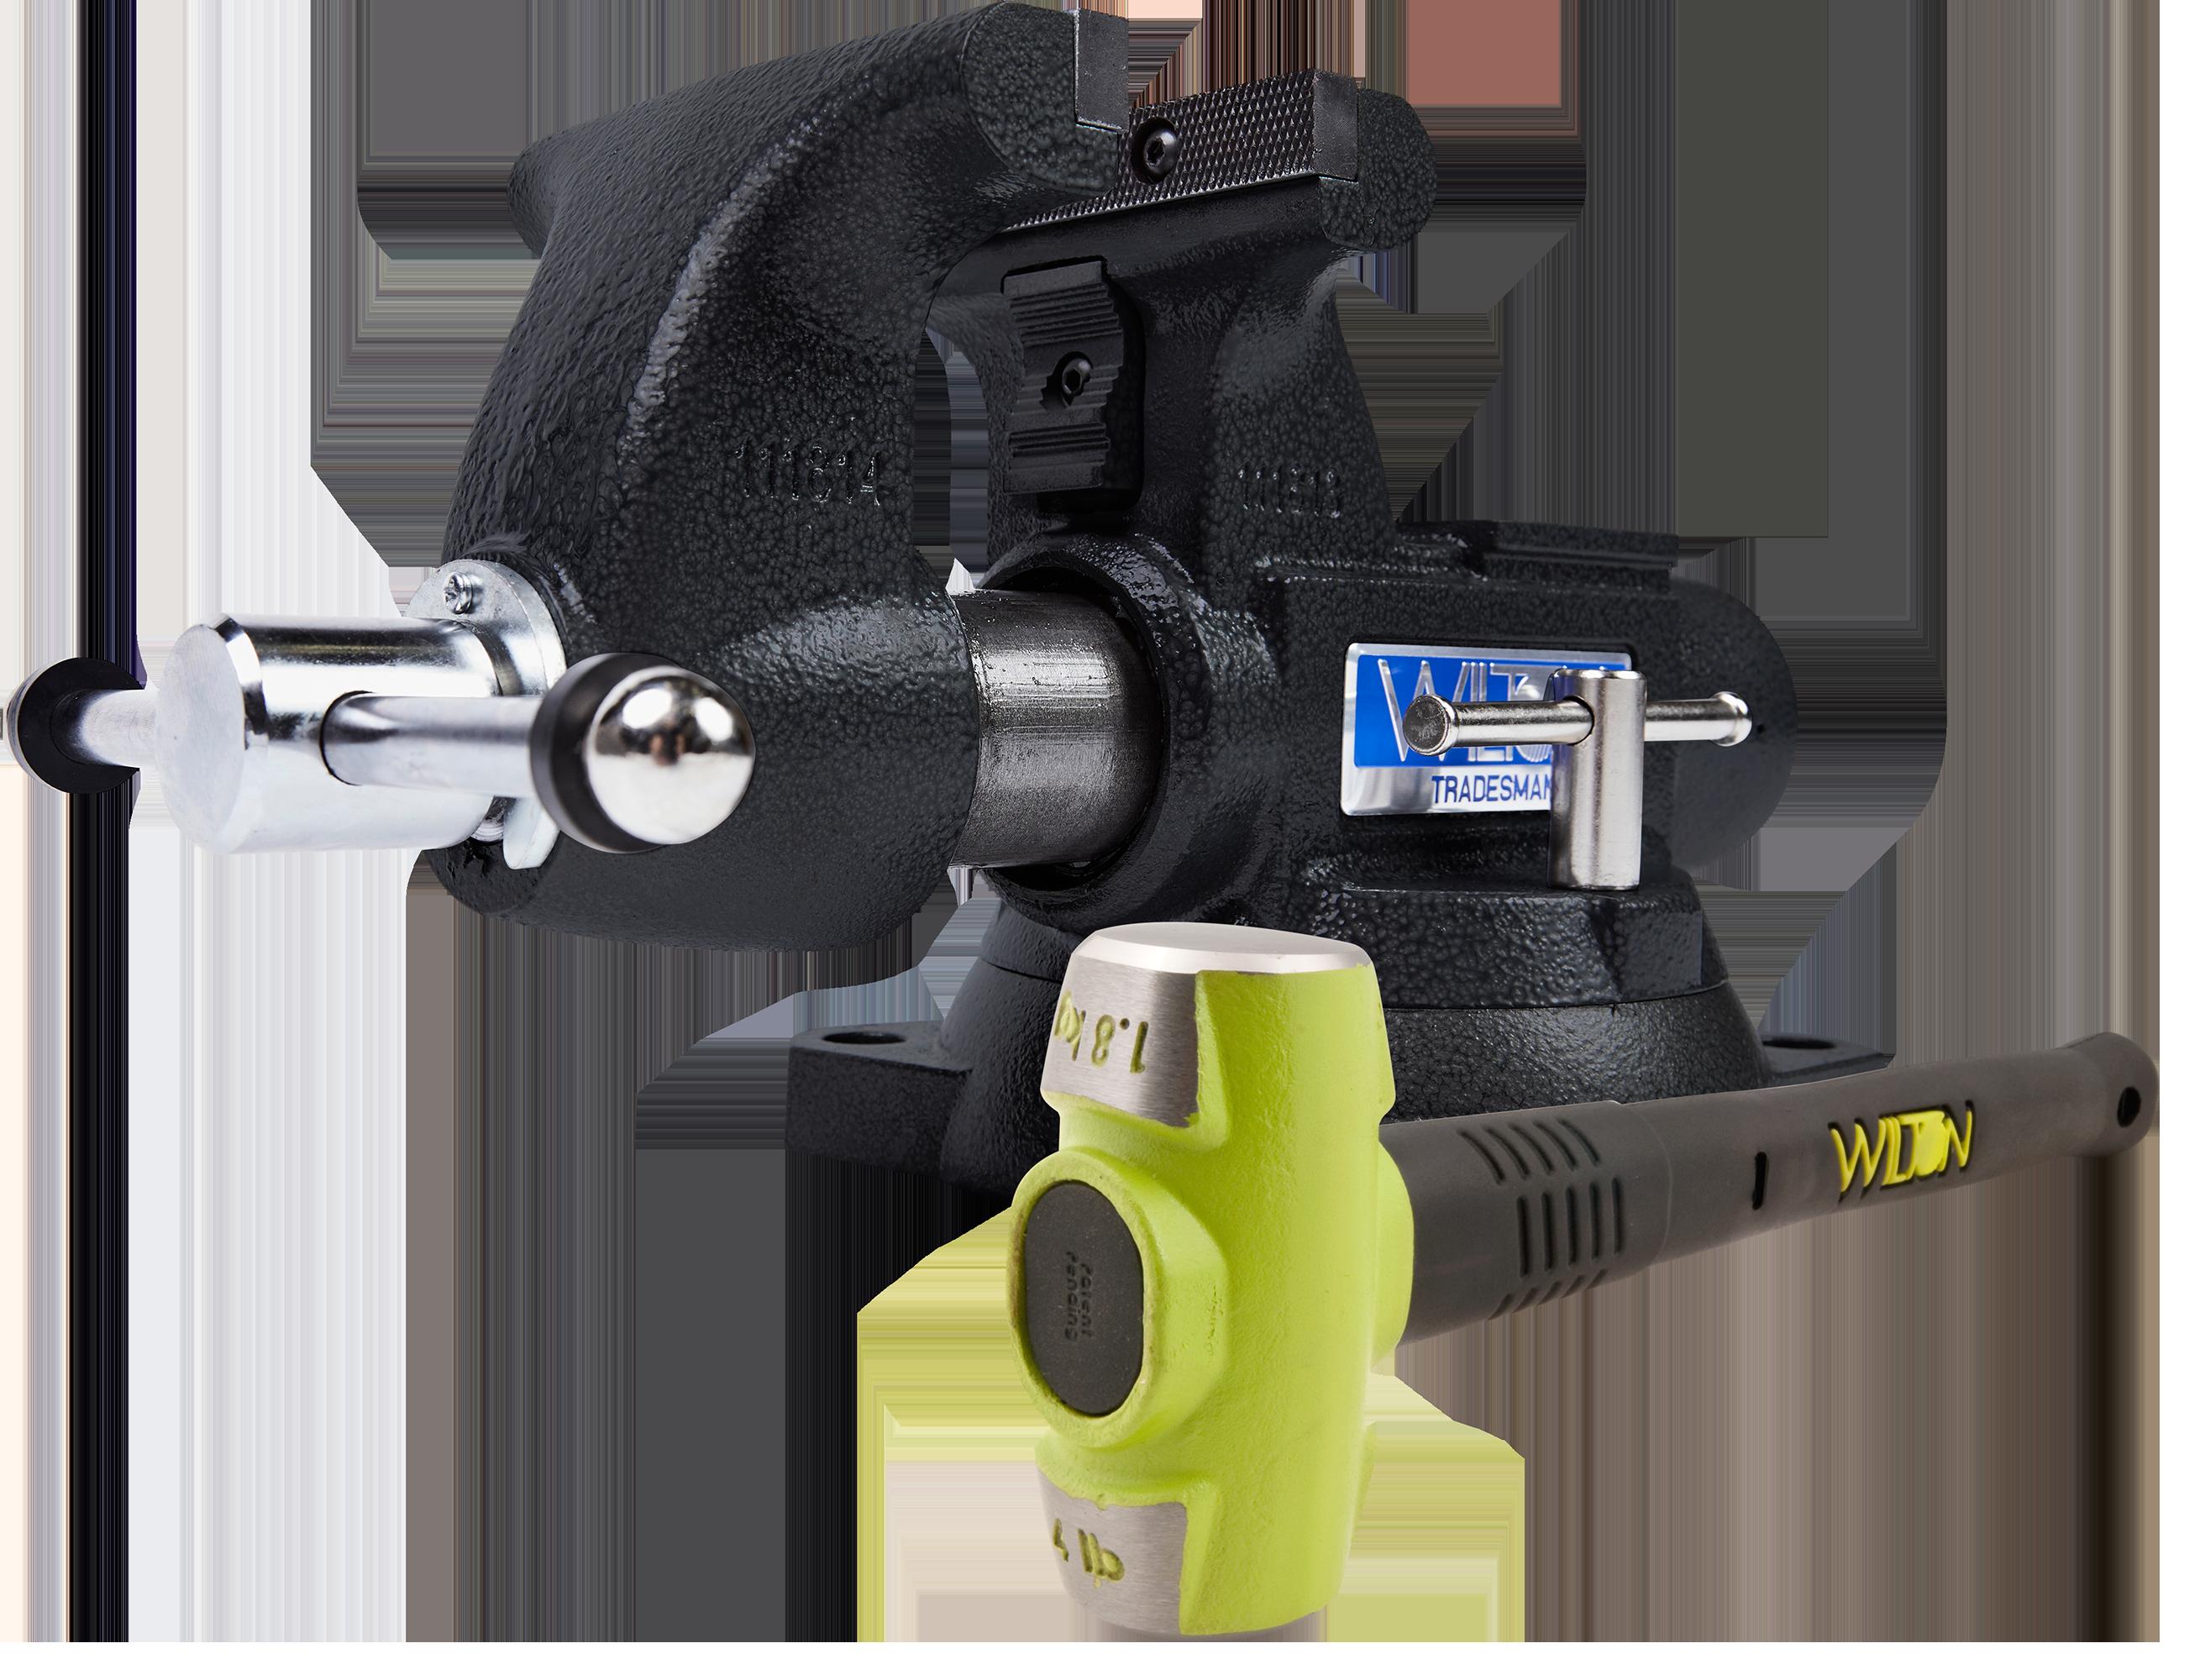 Manual: SE Tradesman 1755 Vise  & B.A.S.H® 20416 Sledge Hammer